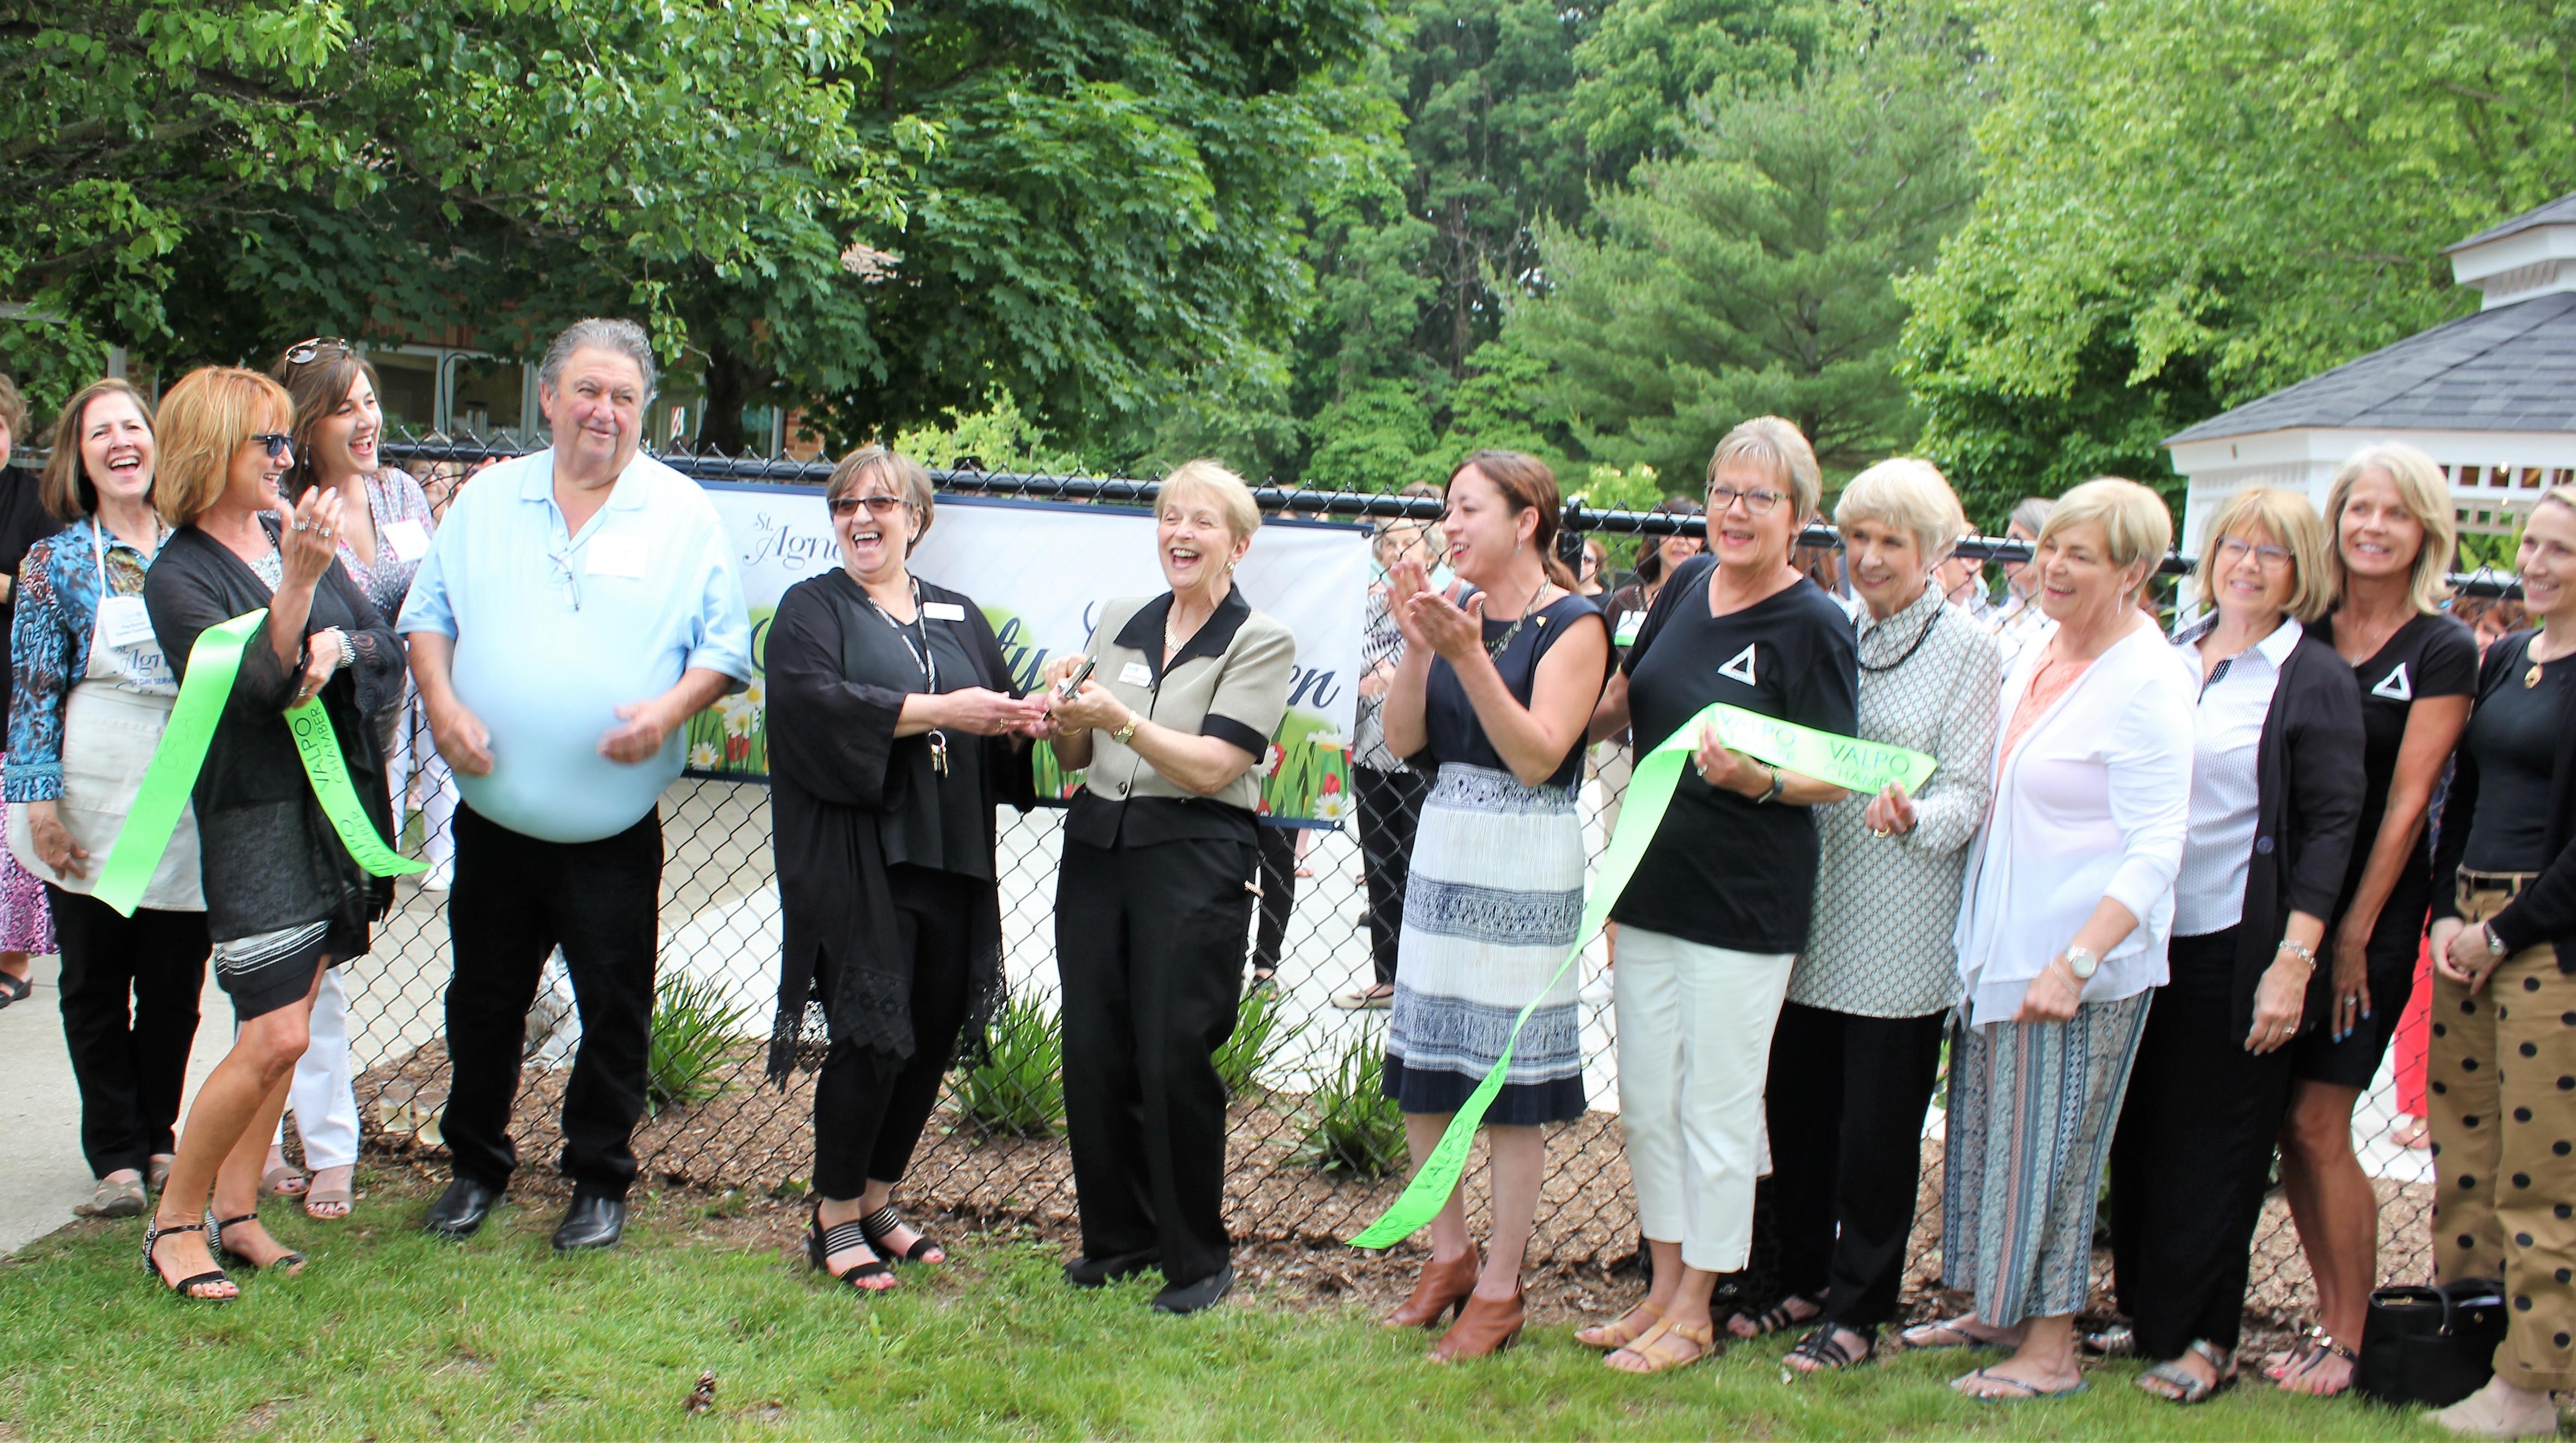 Garden party celebrates St. Agnes' outdoor oasis